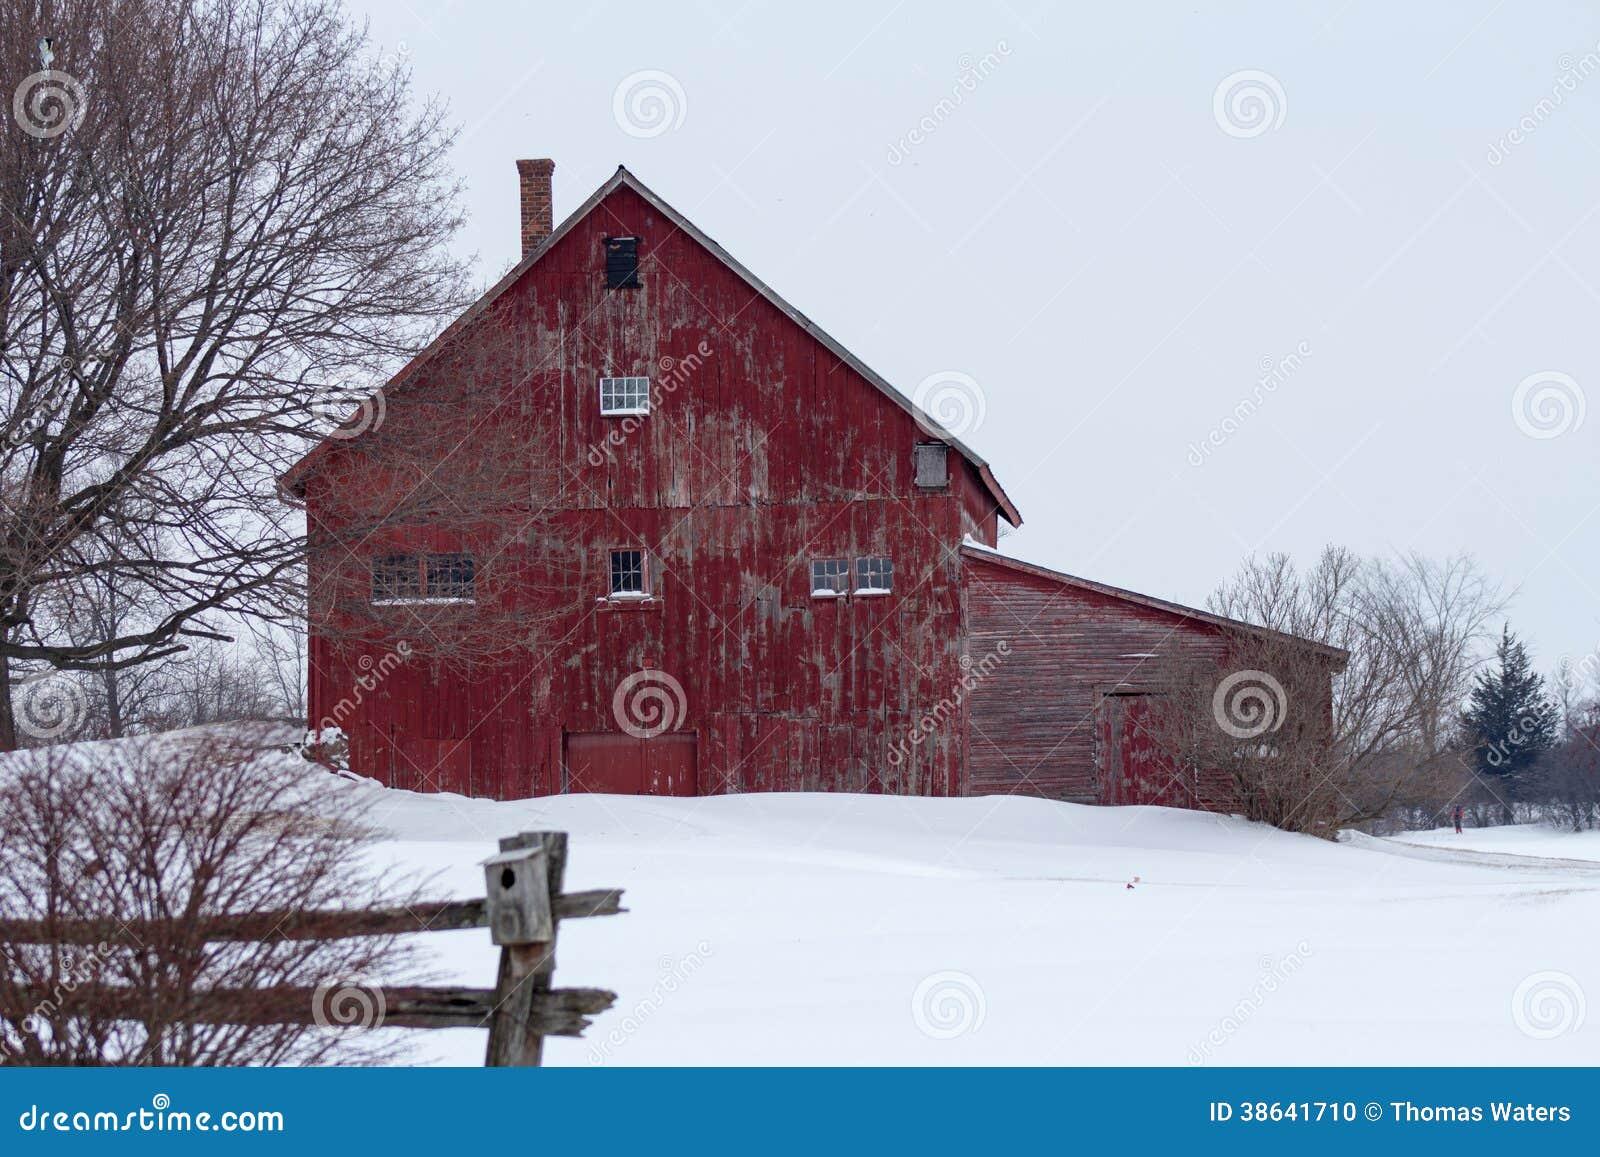 Rustic Red Winter Barn Stock Photo Image 38641710